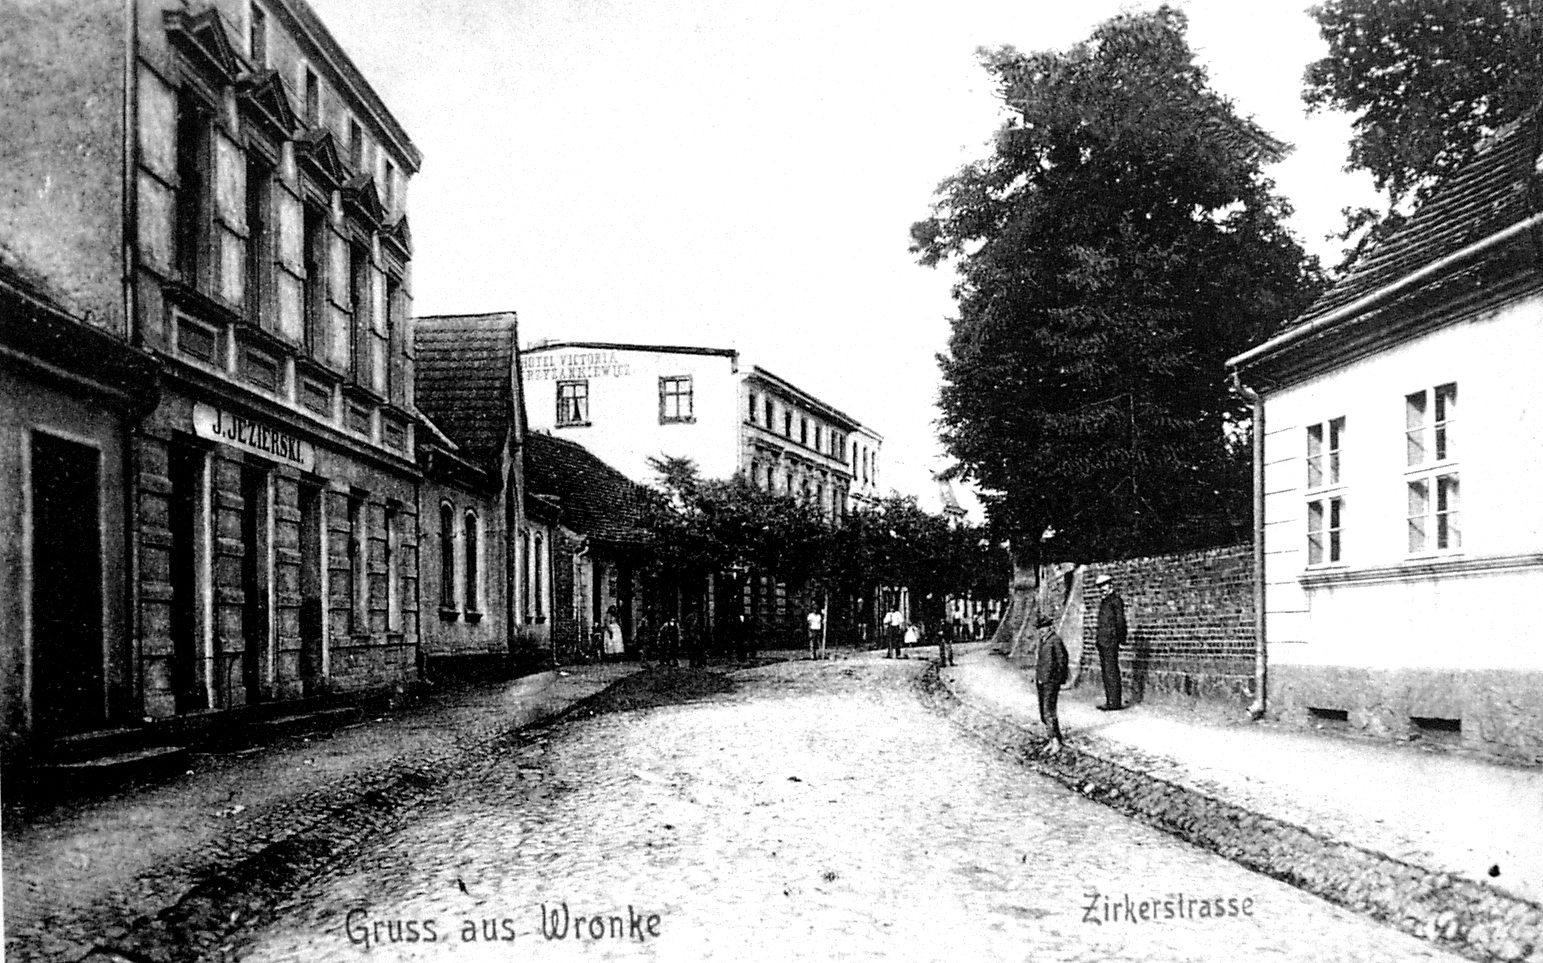 hotelsierakowska